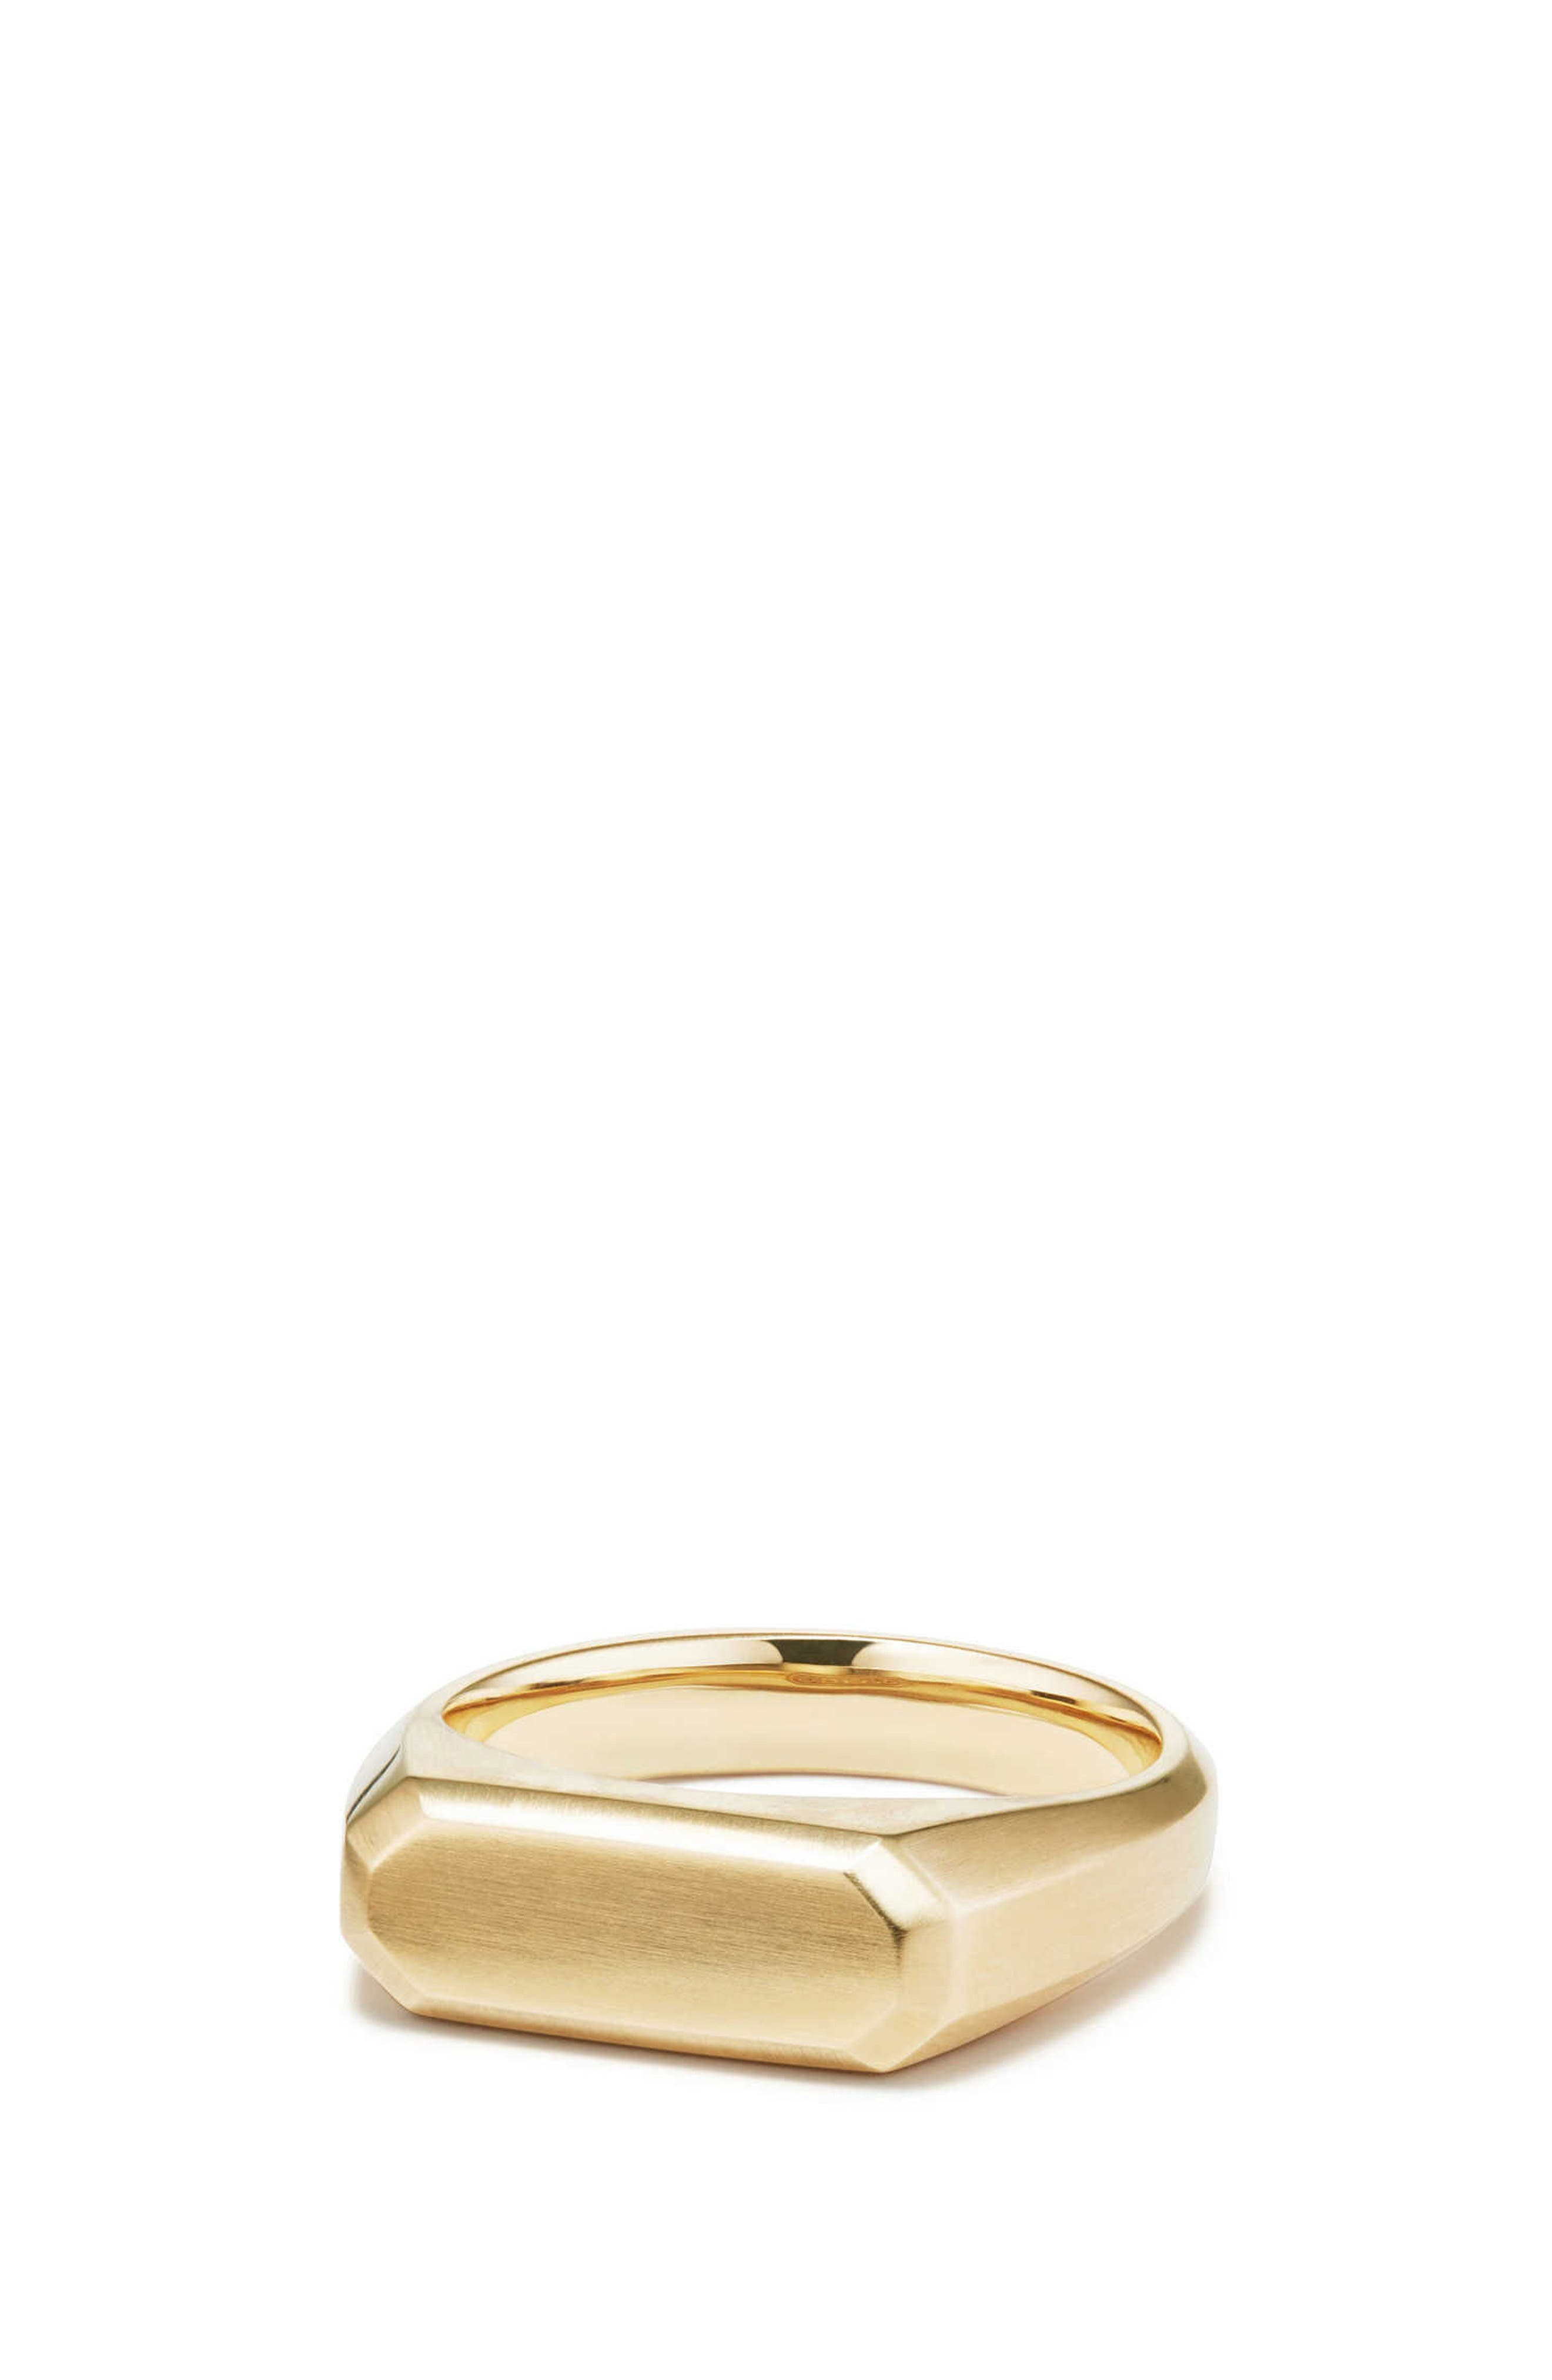 David Yurman Streamline Signet Ring in 18K Gold